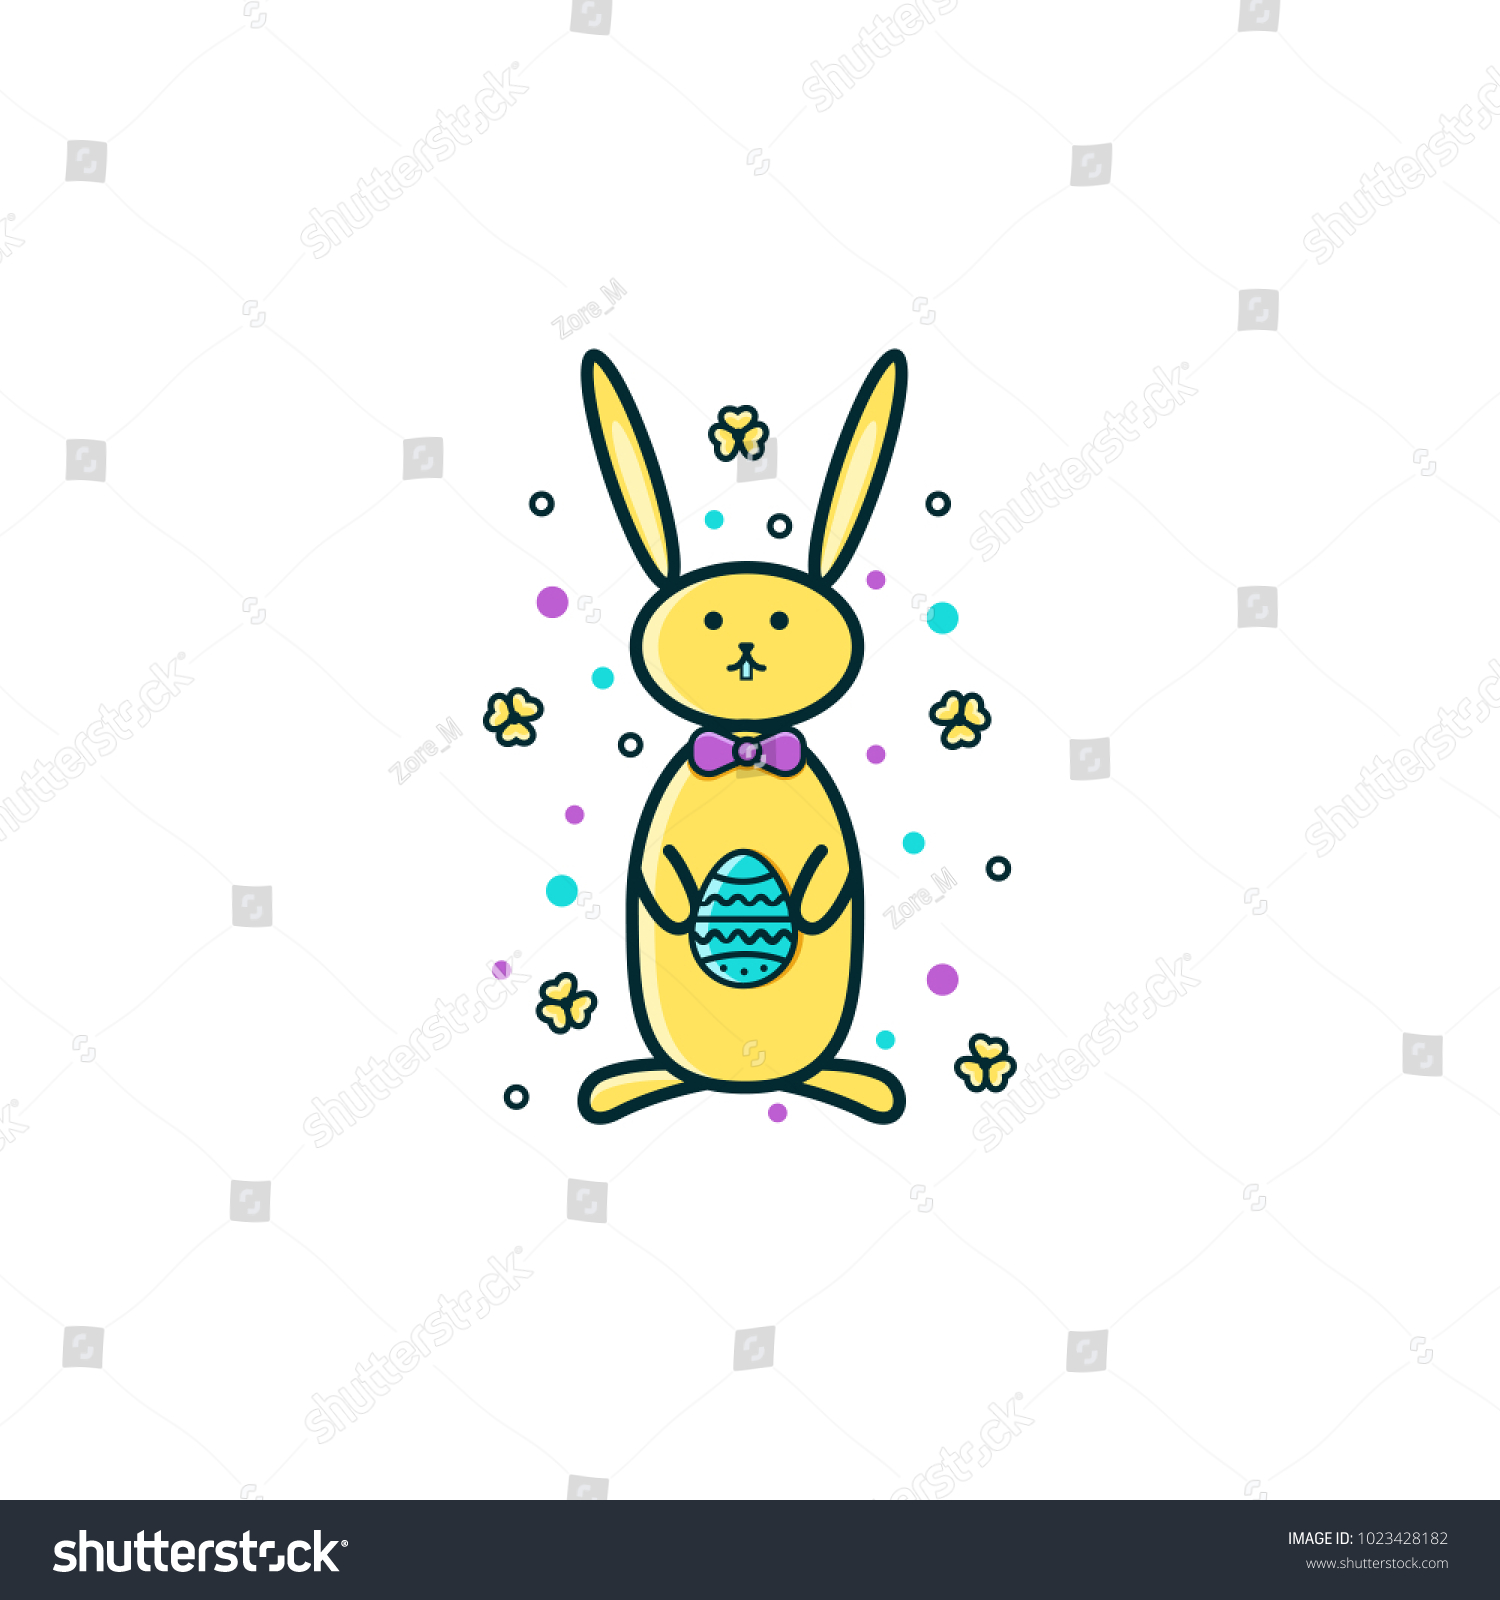 Easter Bunny Rabbit Hare Egg Symbols Stock Vector Royalty Free